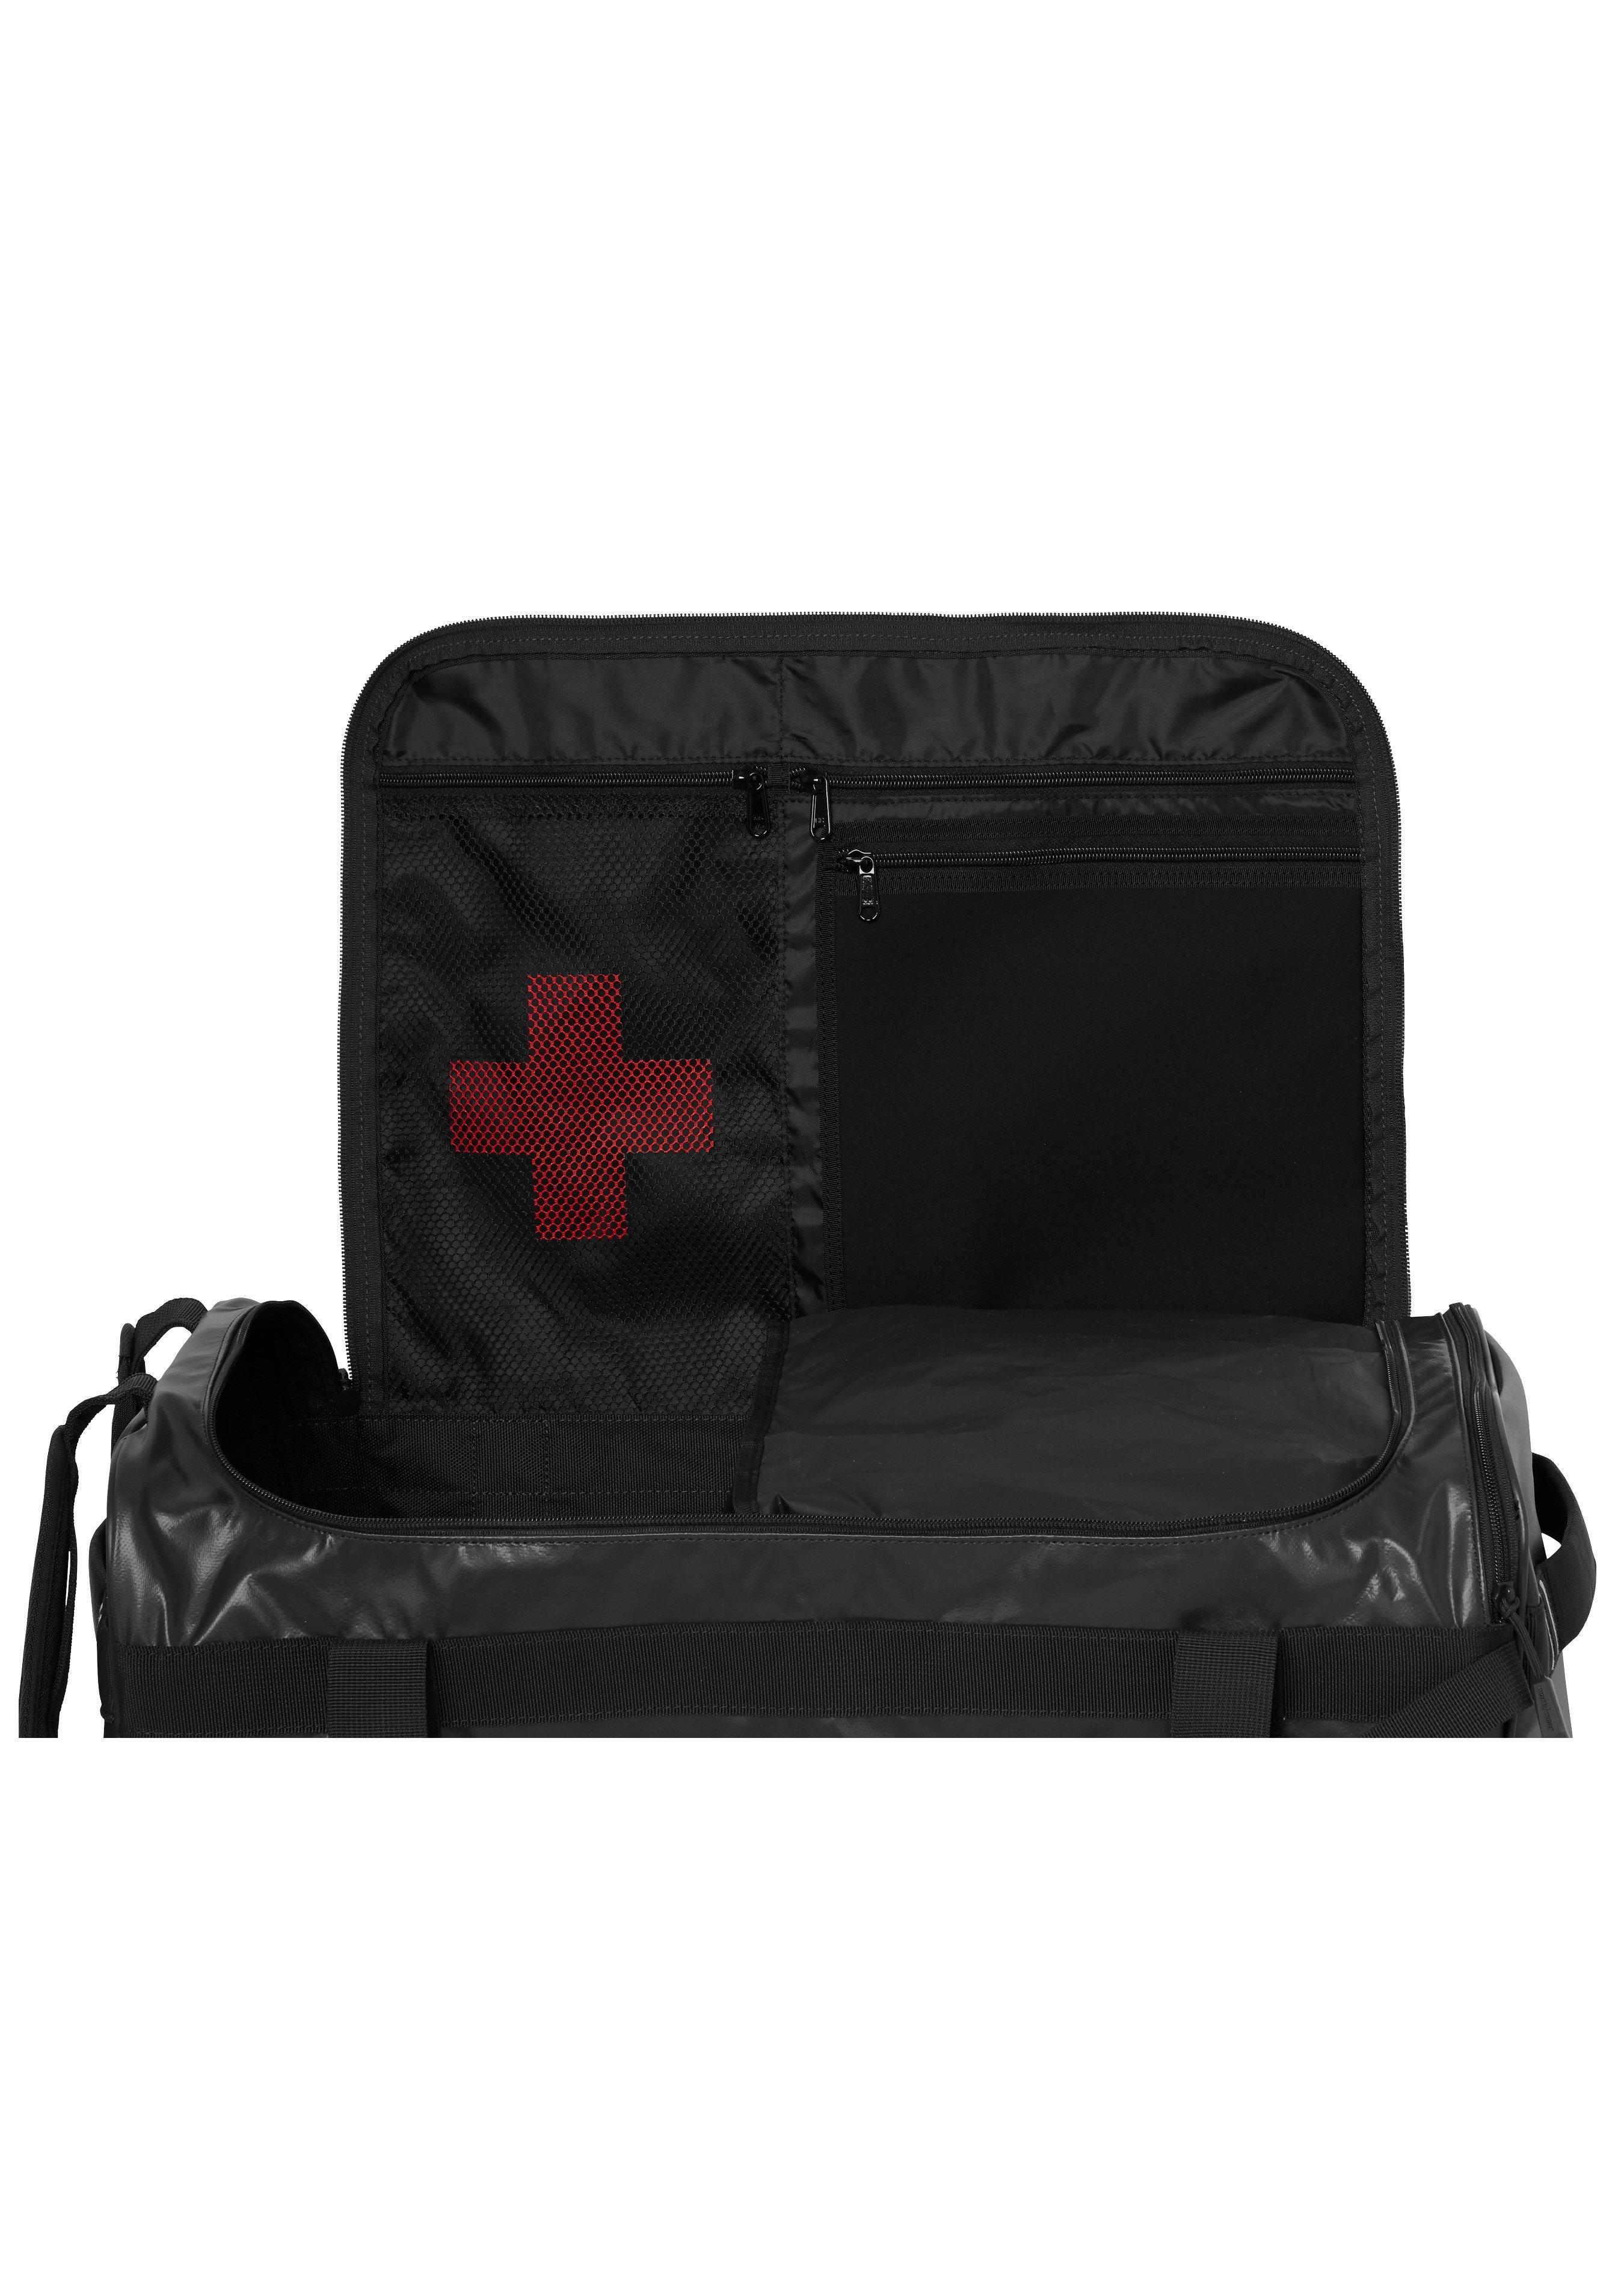 Helly Hansen Tasche Duffel Bag 90 Liter 288110 5